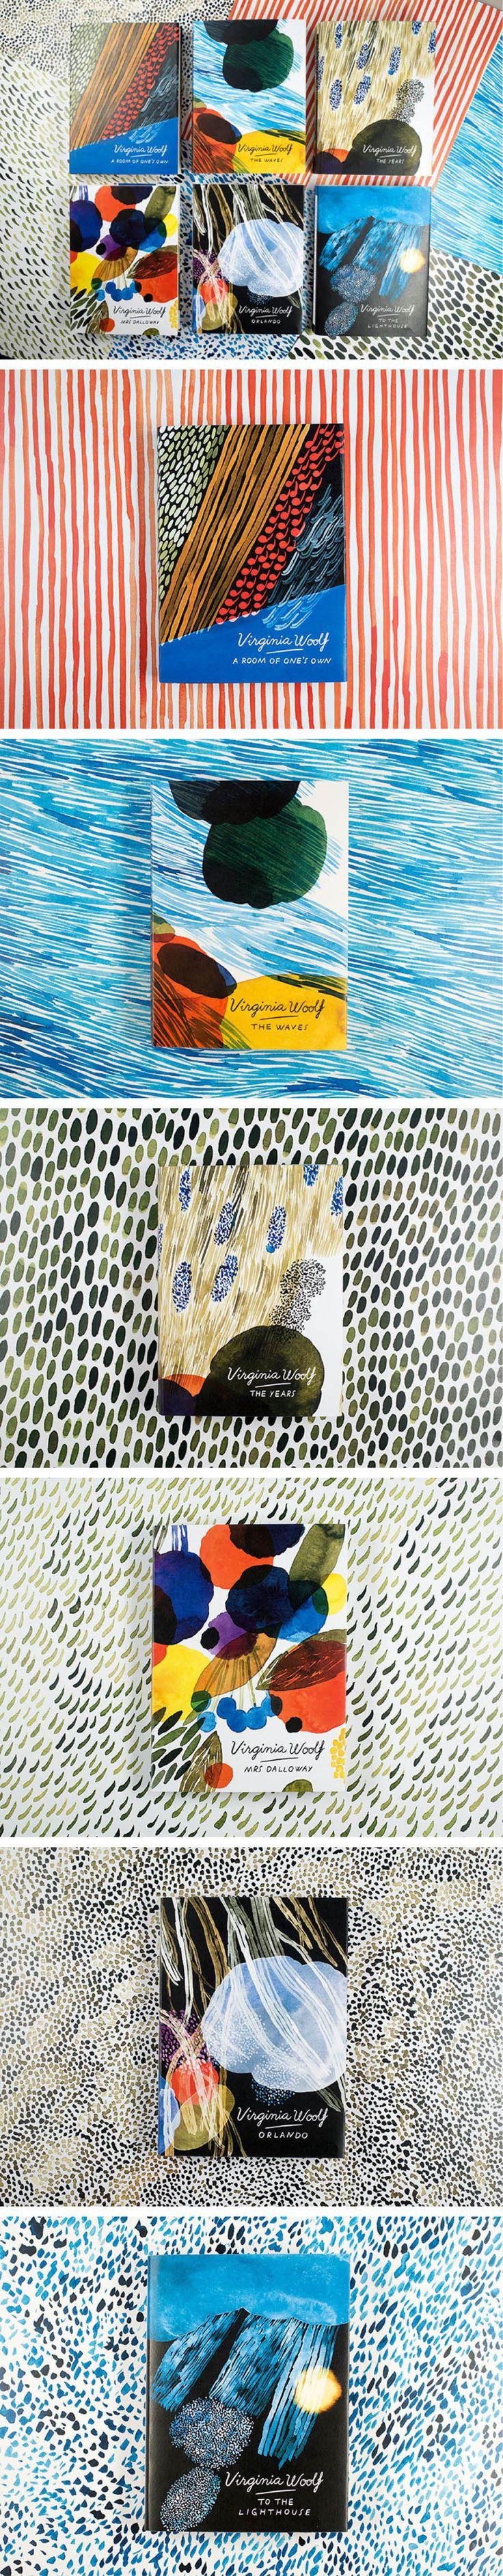 Virginia Woolf covers by illustrator Aino-Maija Metsola